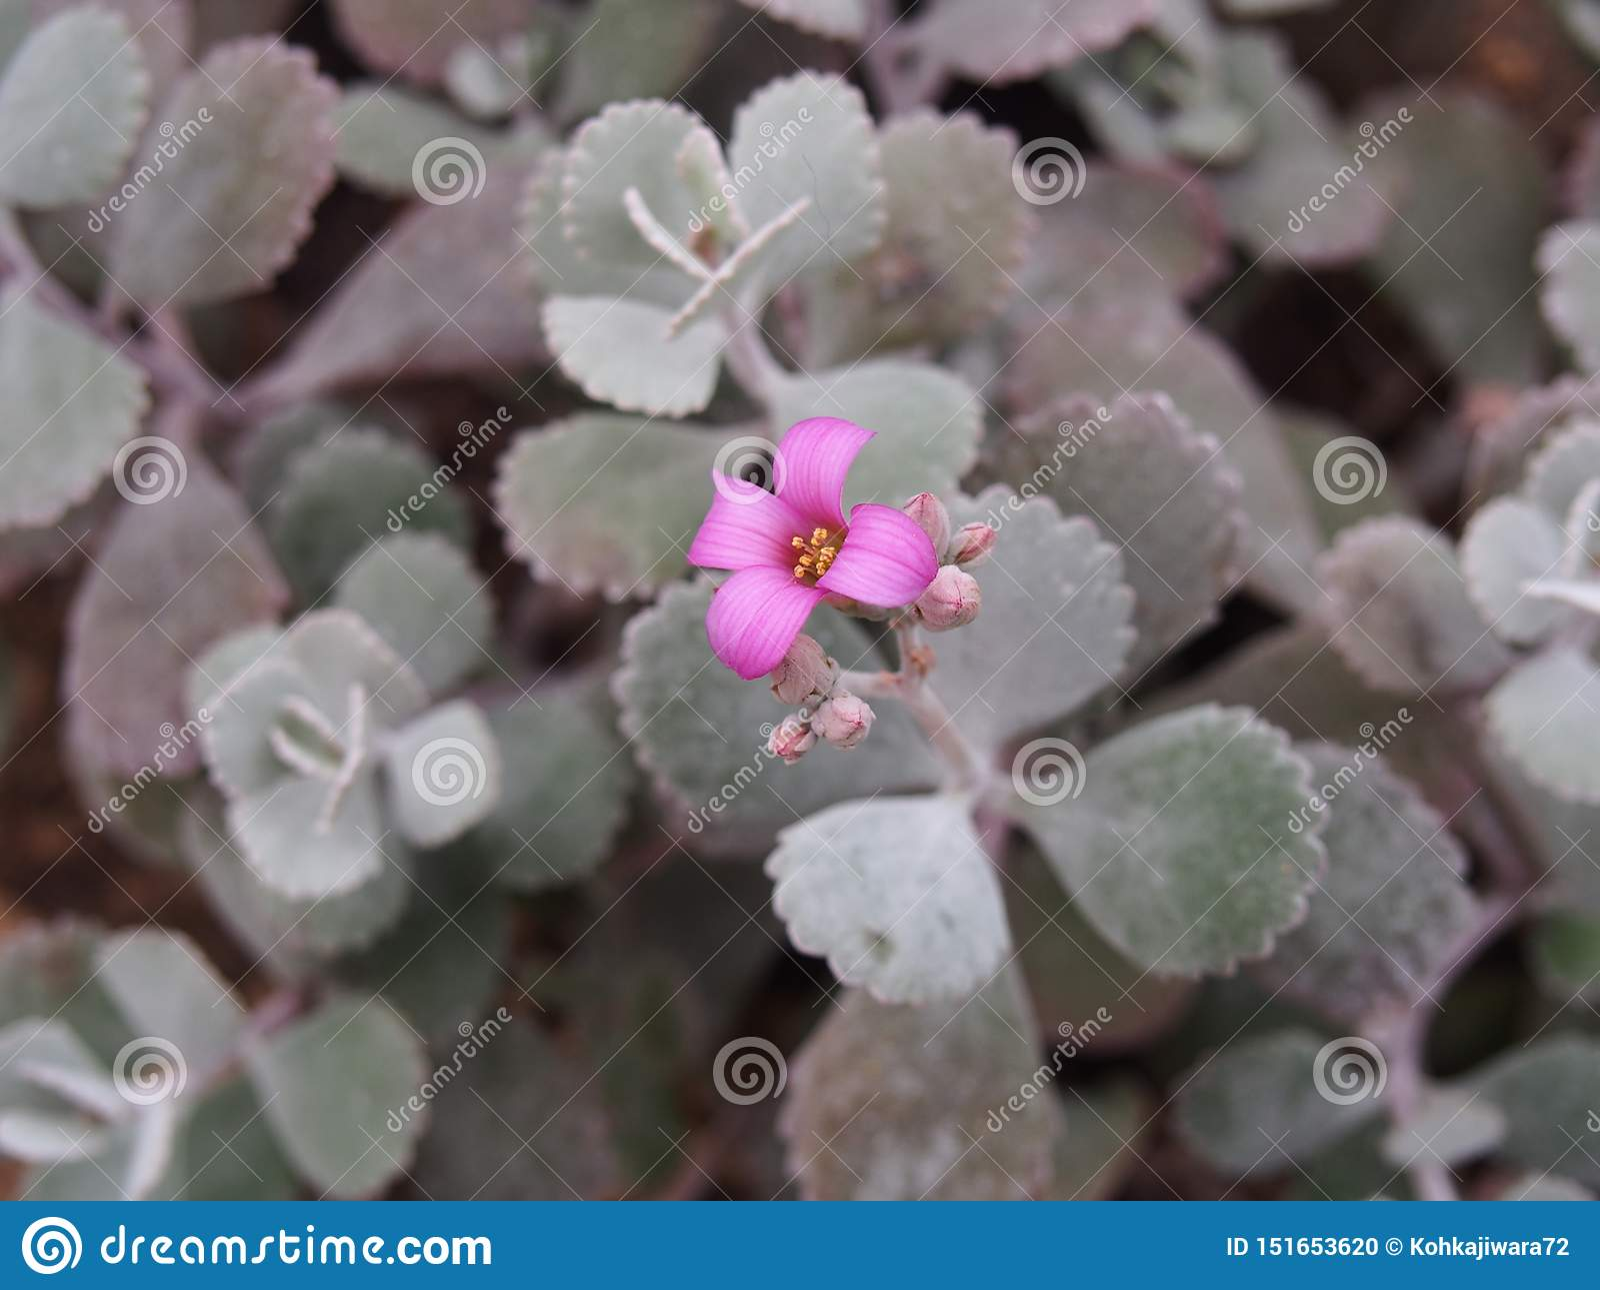 Purple flowers of a cactus, berlin-dahlem botanic garden